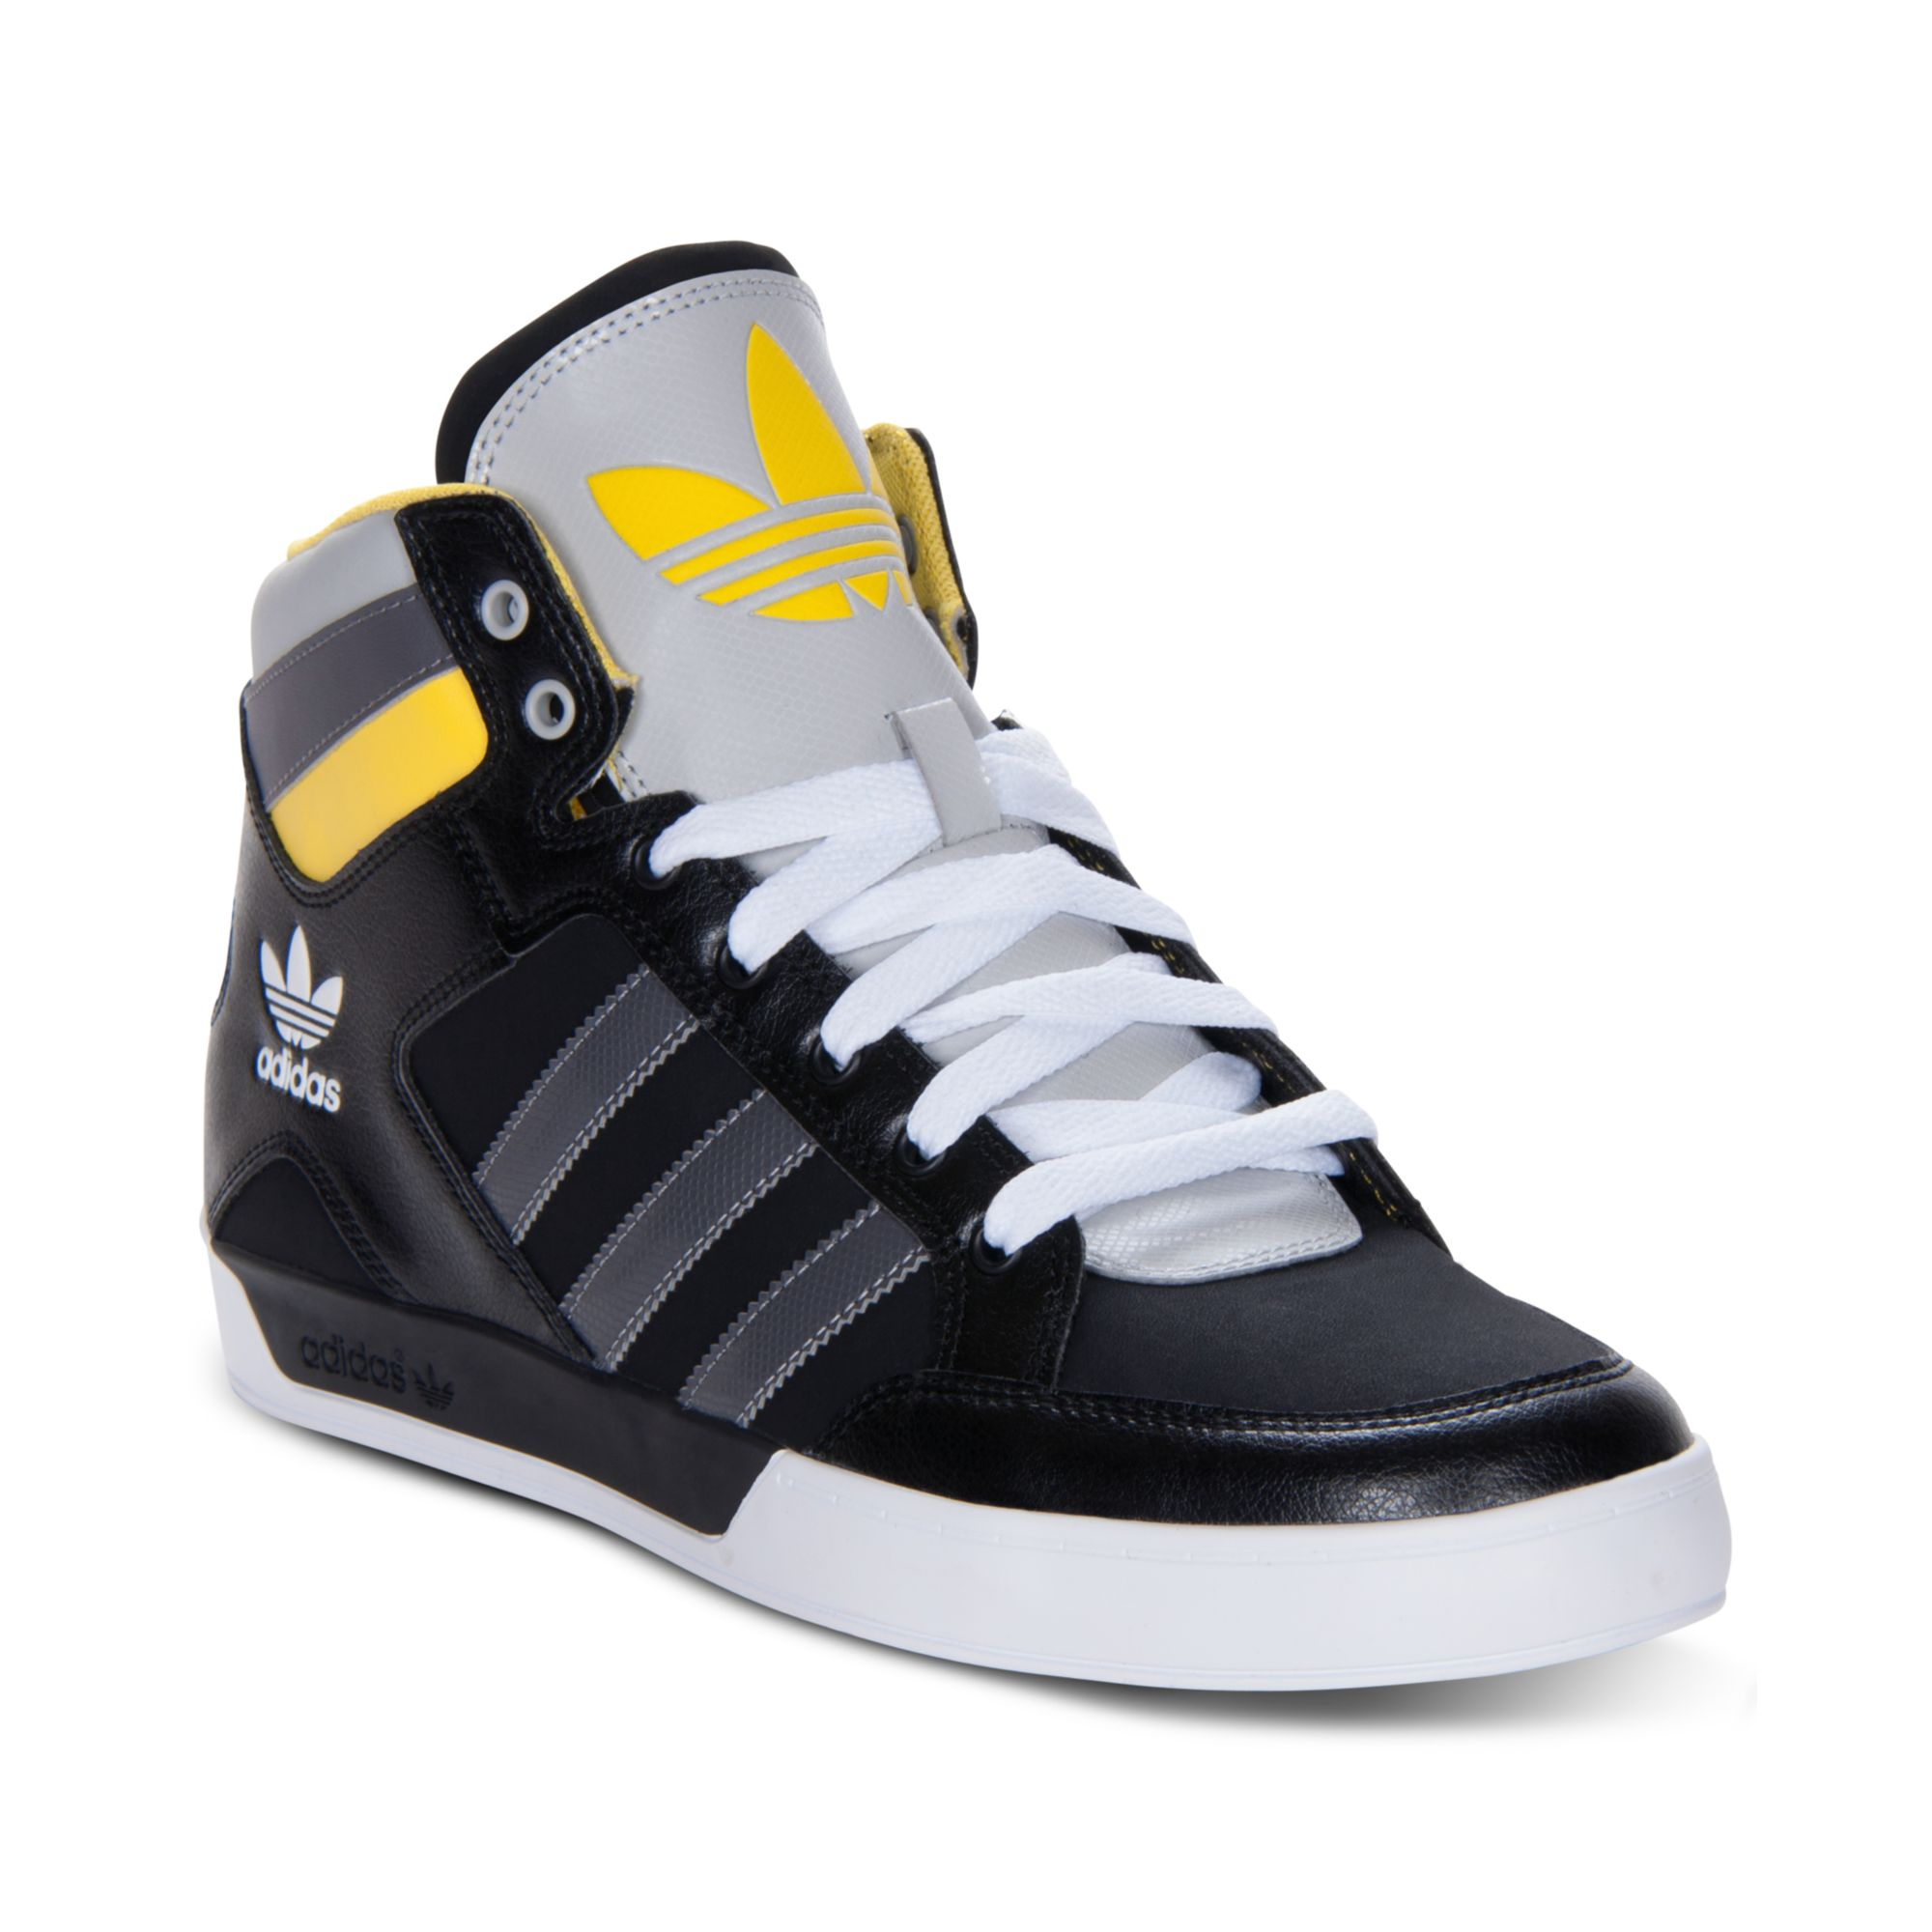 Lyst - adidas Originals Hard Court Hi Casual Sneakers in Black for Men 2e7c654cf4734